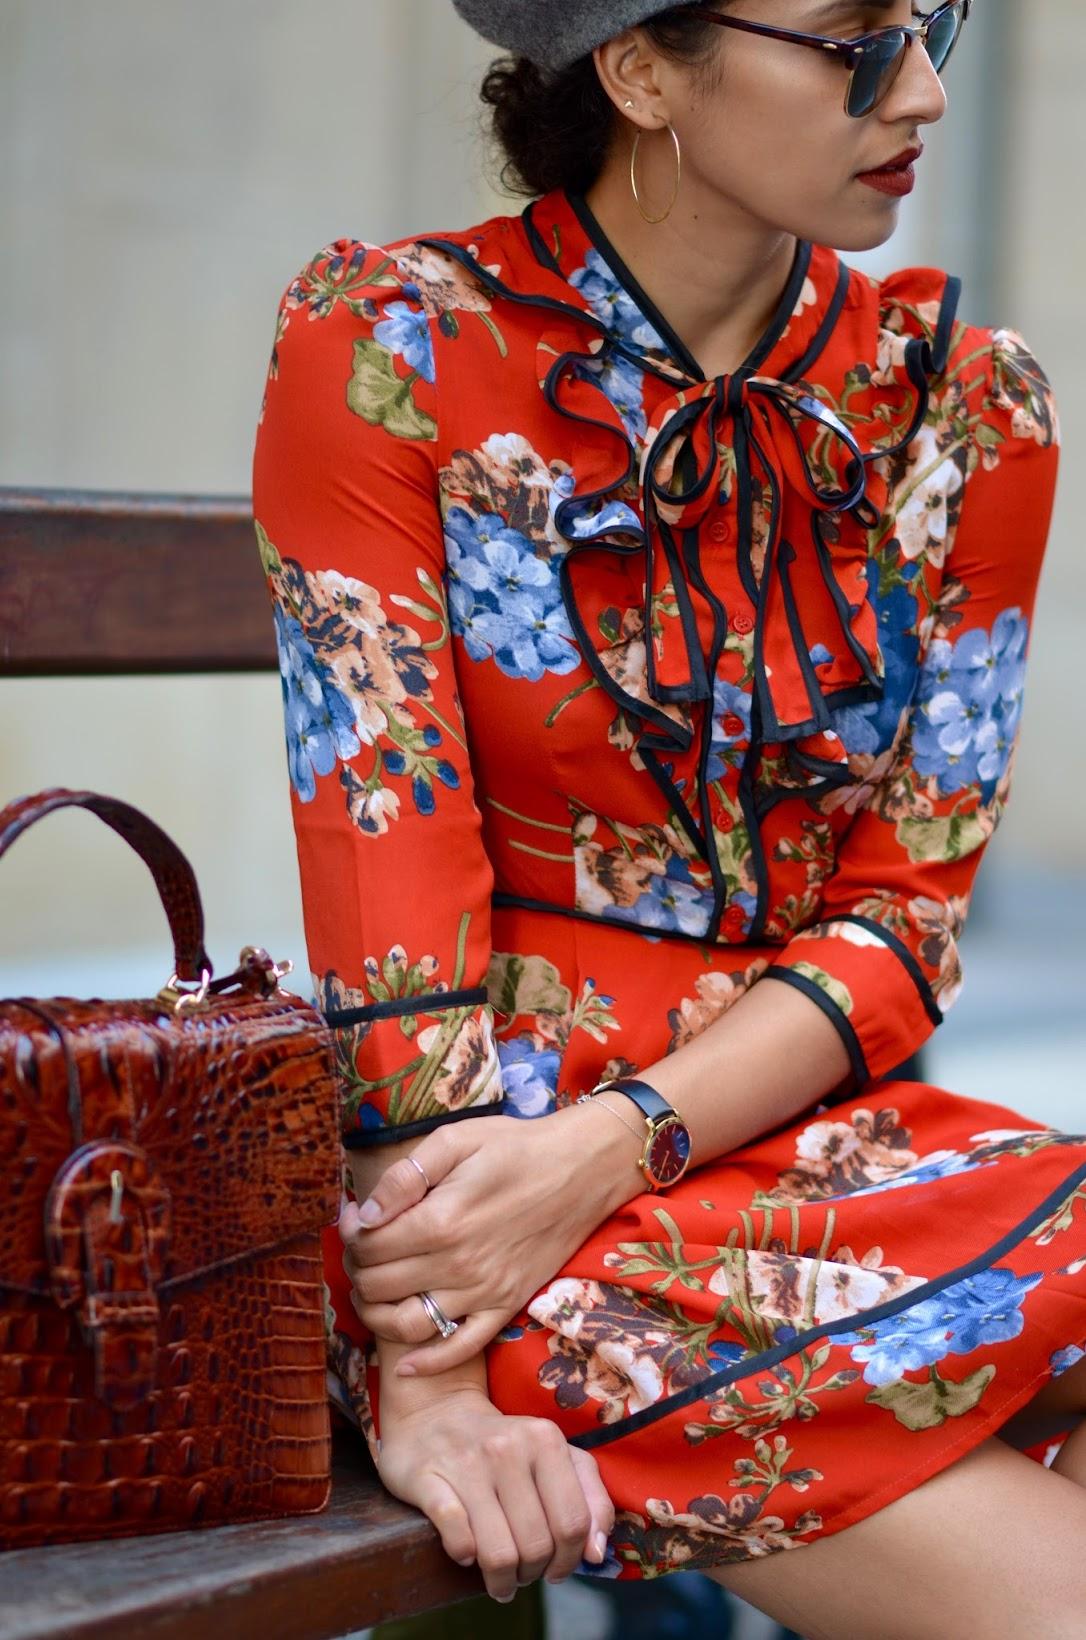 Brahmin leather satchel, grey beret, fall berry lipstick, Colour Pop, hoop earrings, red floral dres, San Sebastian, Spain